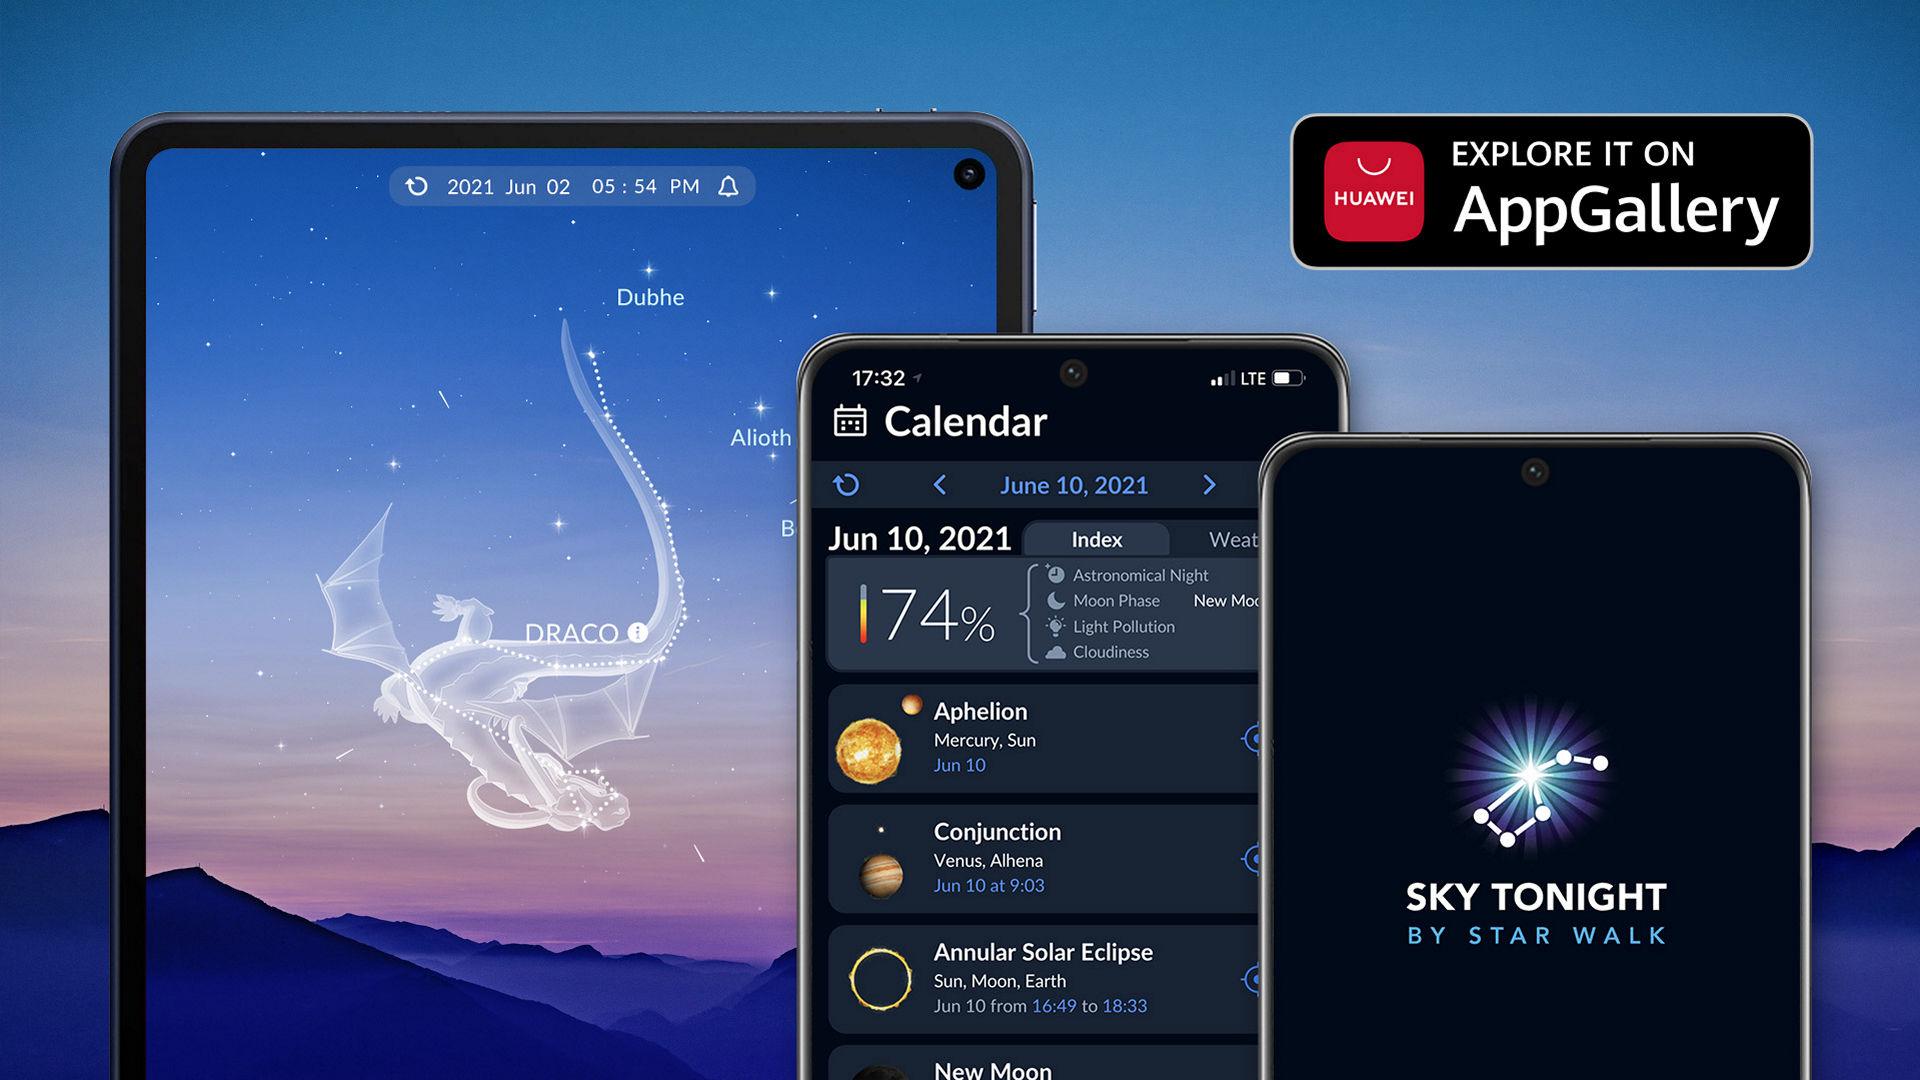 Sky Tonight by Star Walk on AppGallery